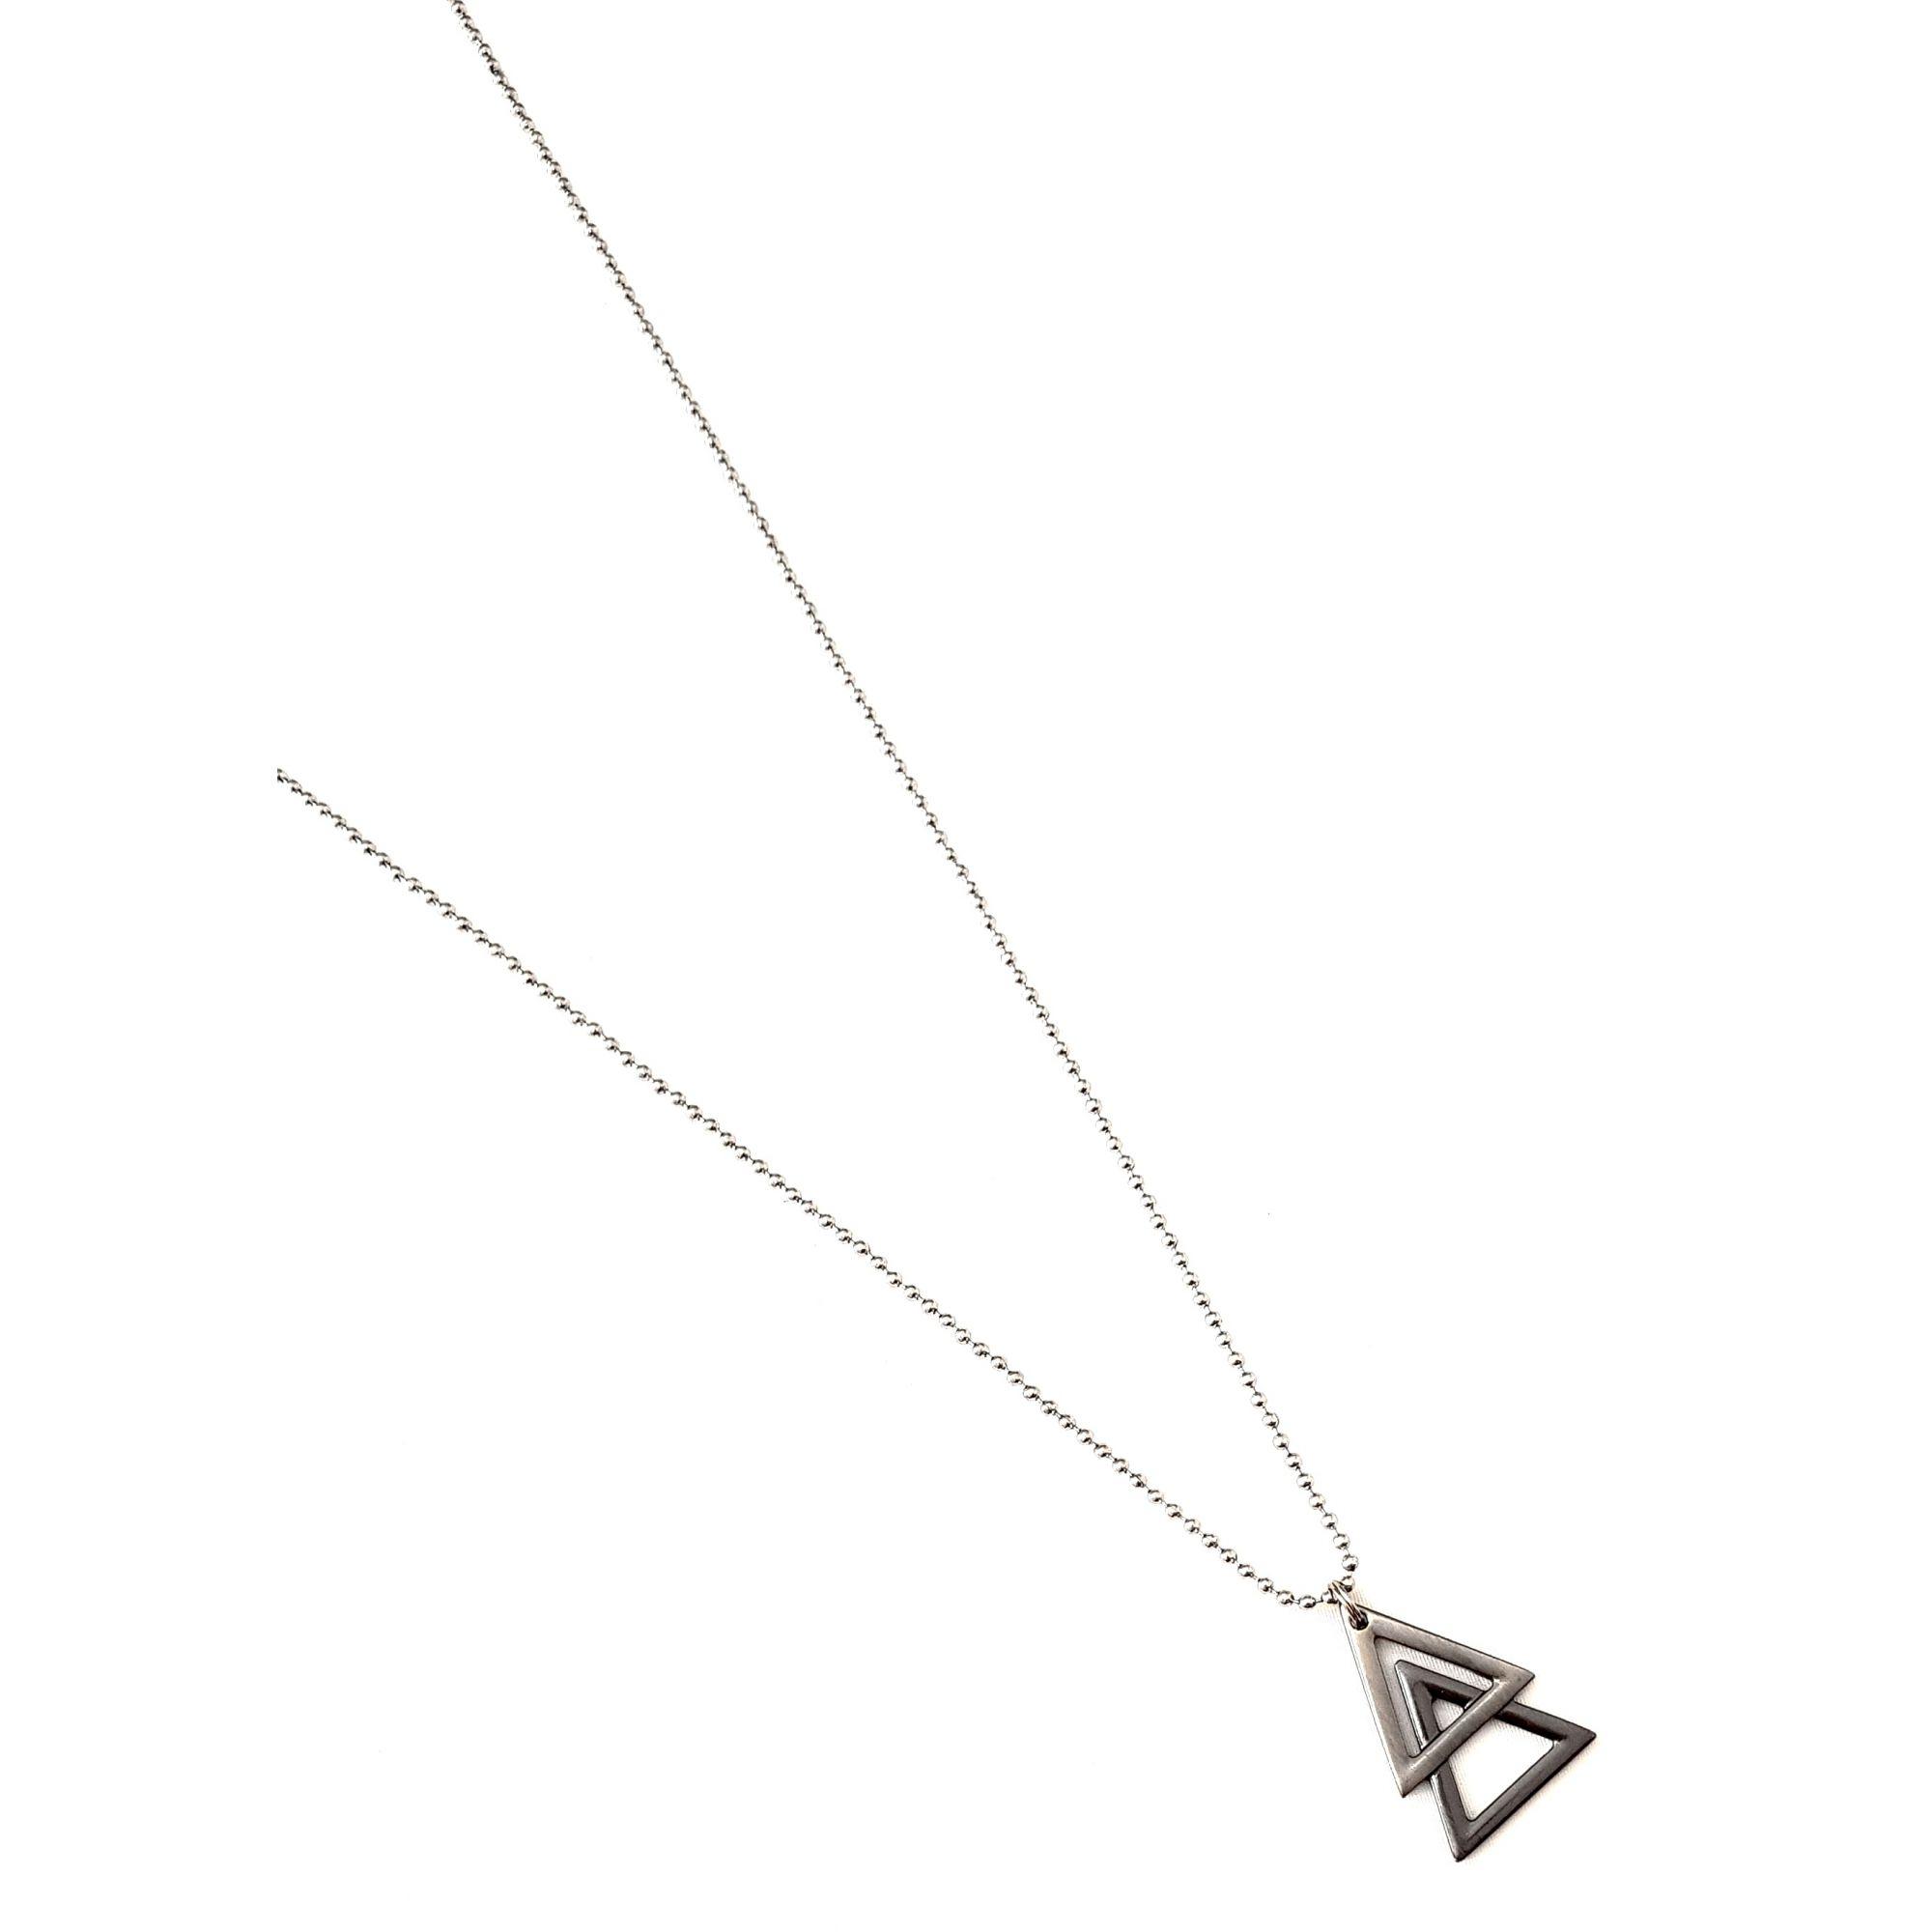 Corrente de Aço Inox Triângulo Duplo Cor Prata